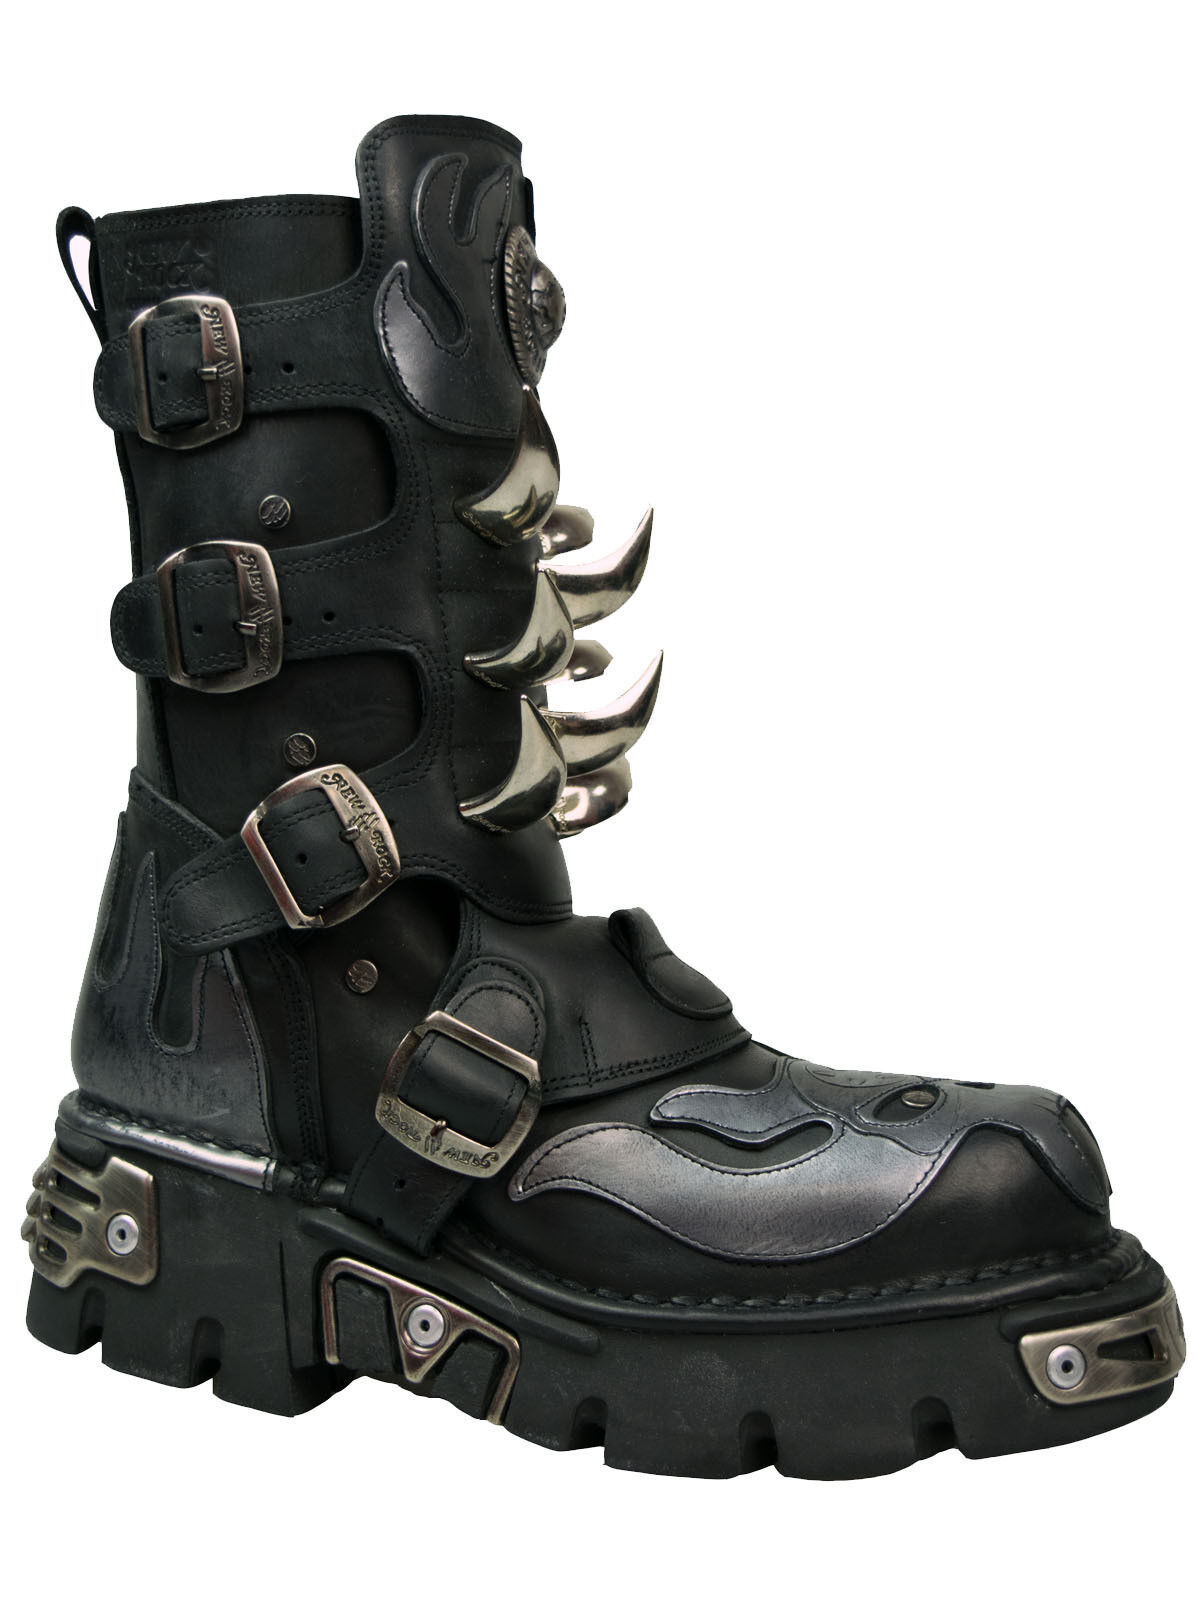 New Rock Stiefel Boot 108 Dämon Nieten Gothic silver Flamme Spikes Reactor  5066